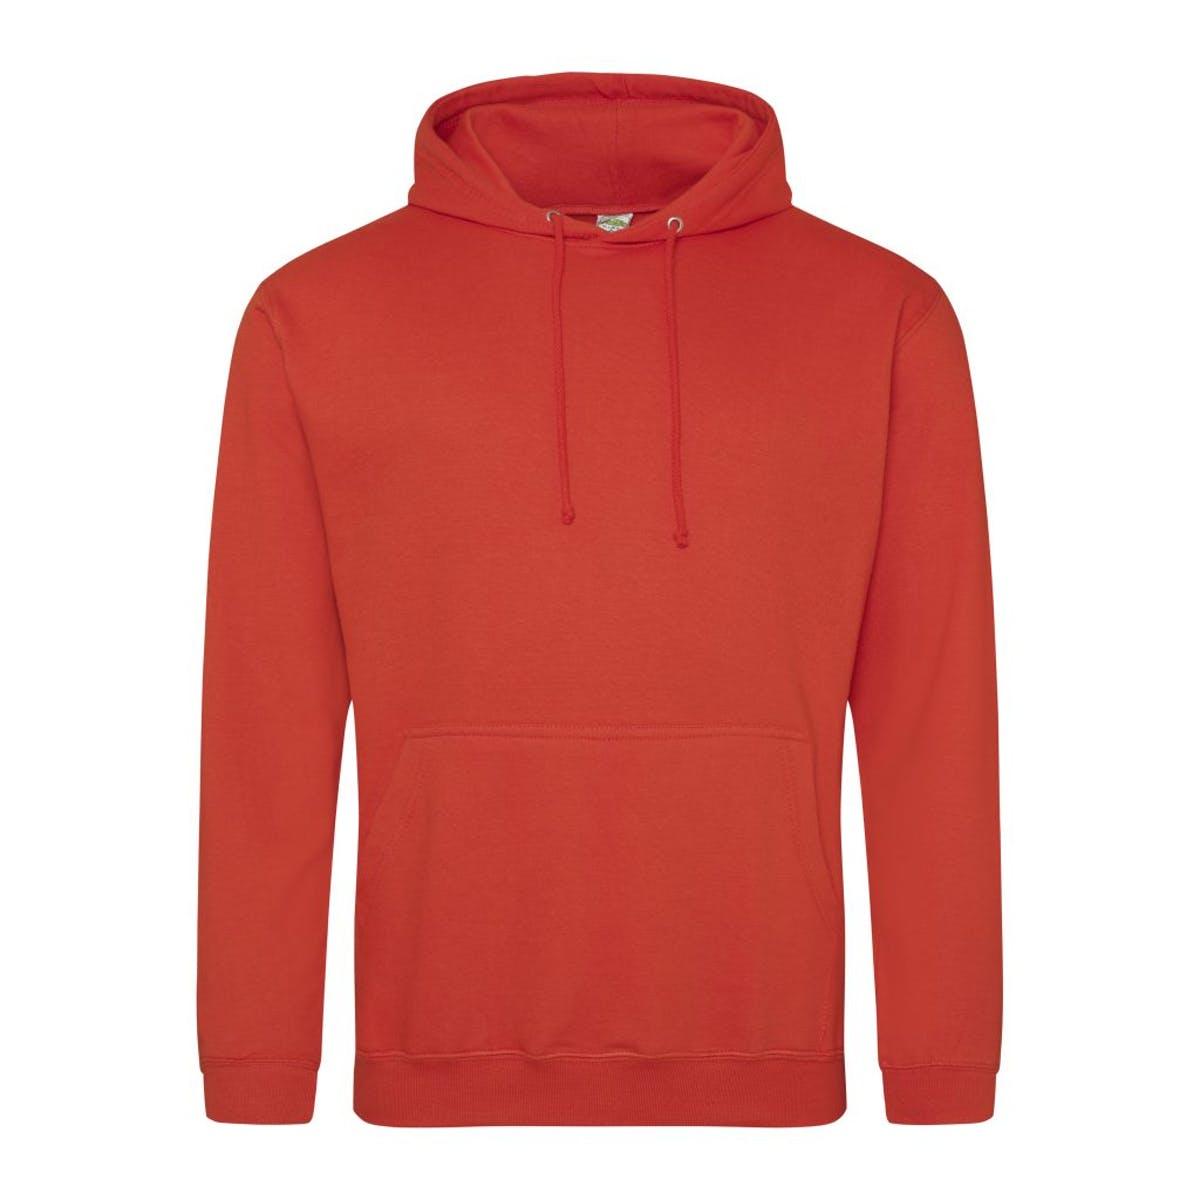 sunset orange college hoodies